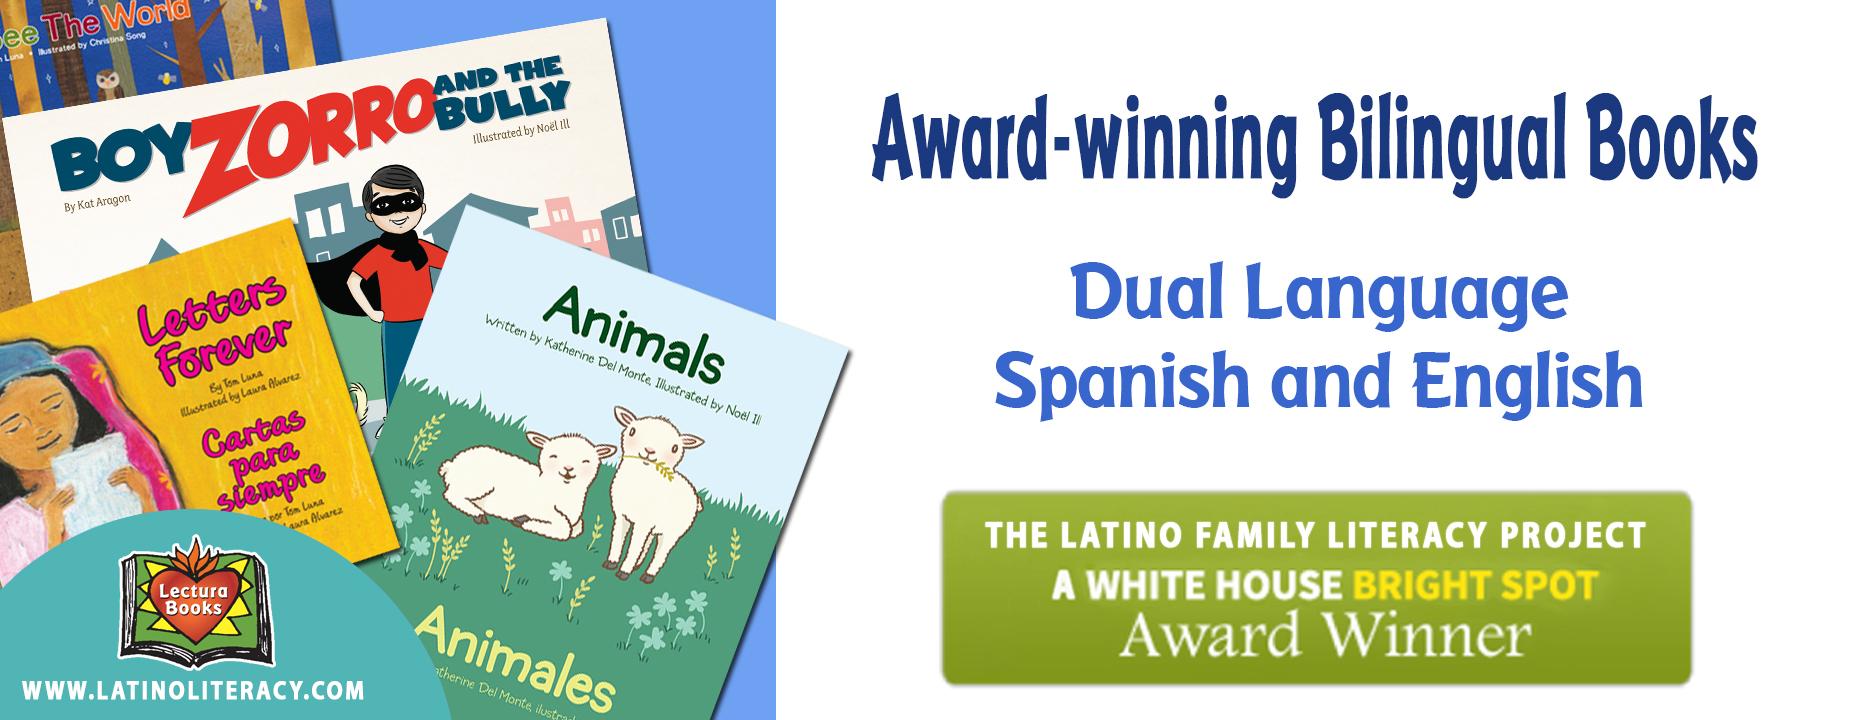 Award-winning dual language books Spanish and English